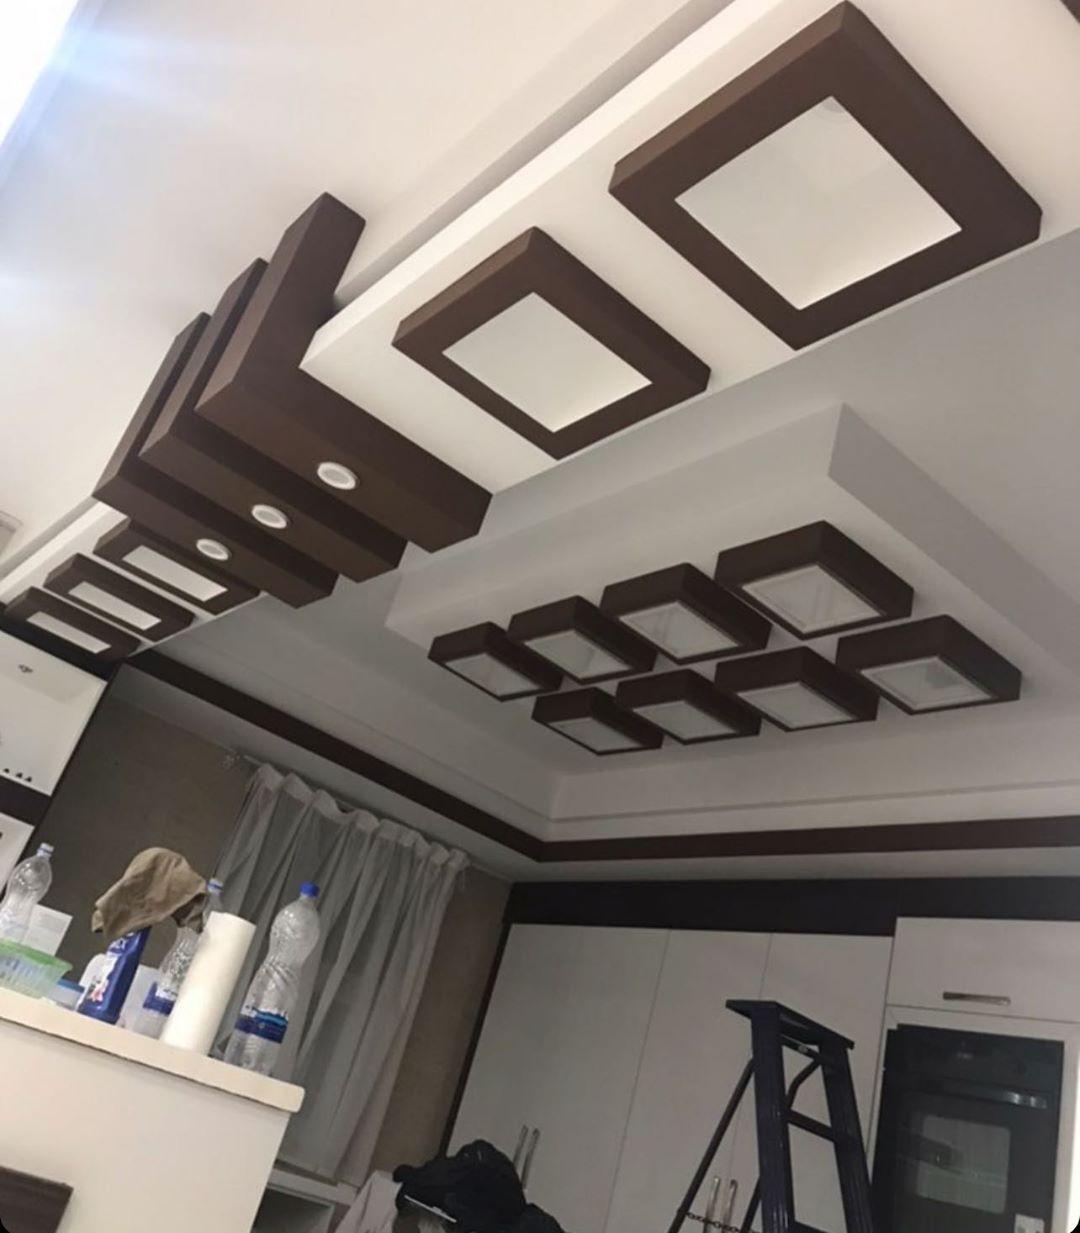 New False Ceiling Designs From Diamond Metal Works Ceiling Design Modern House Ceiling Design Ceiling Design Living Room